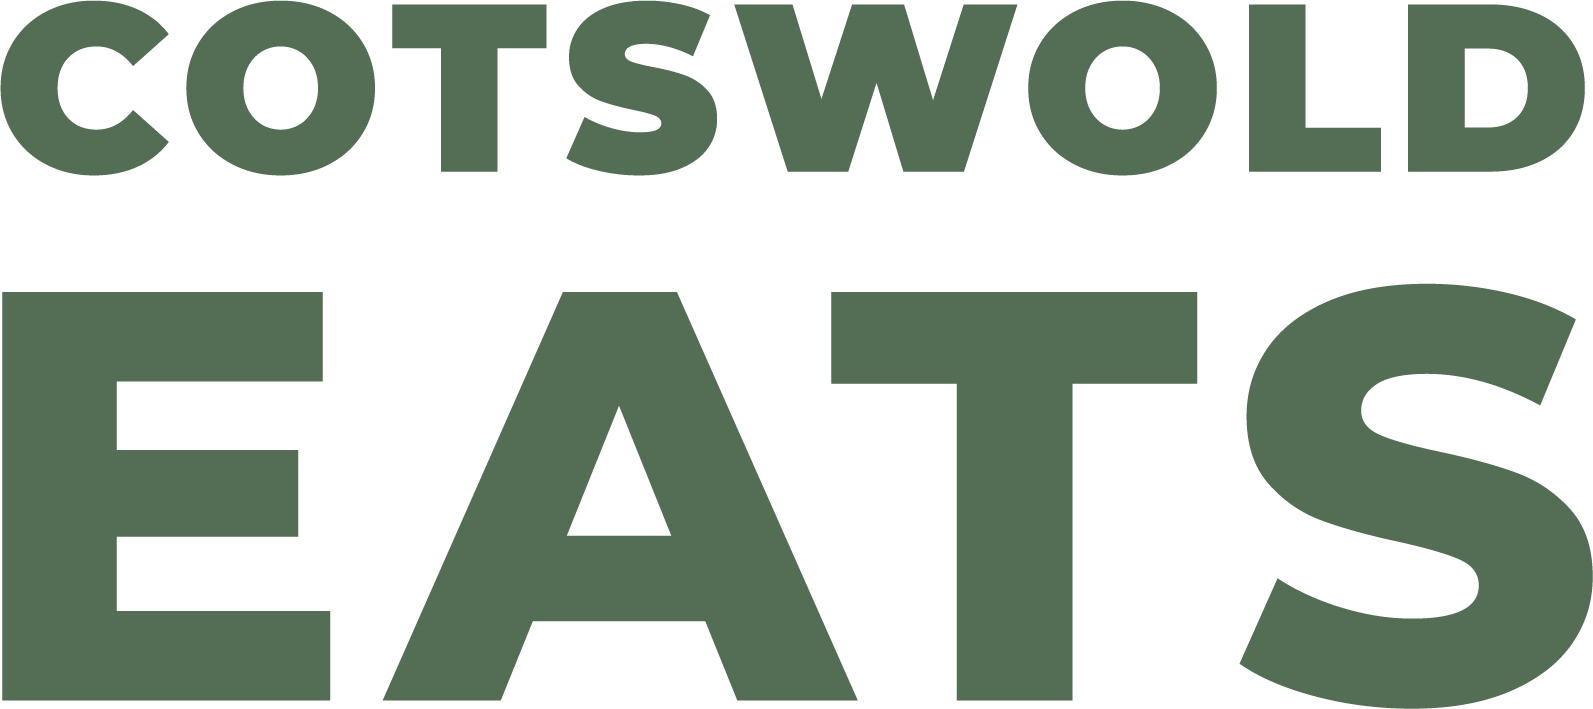 Cotswold Eats Logo